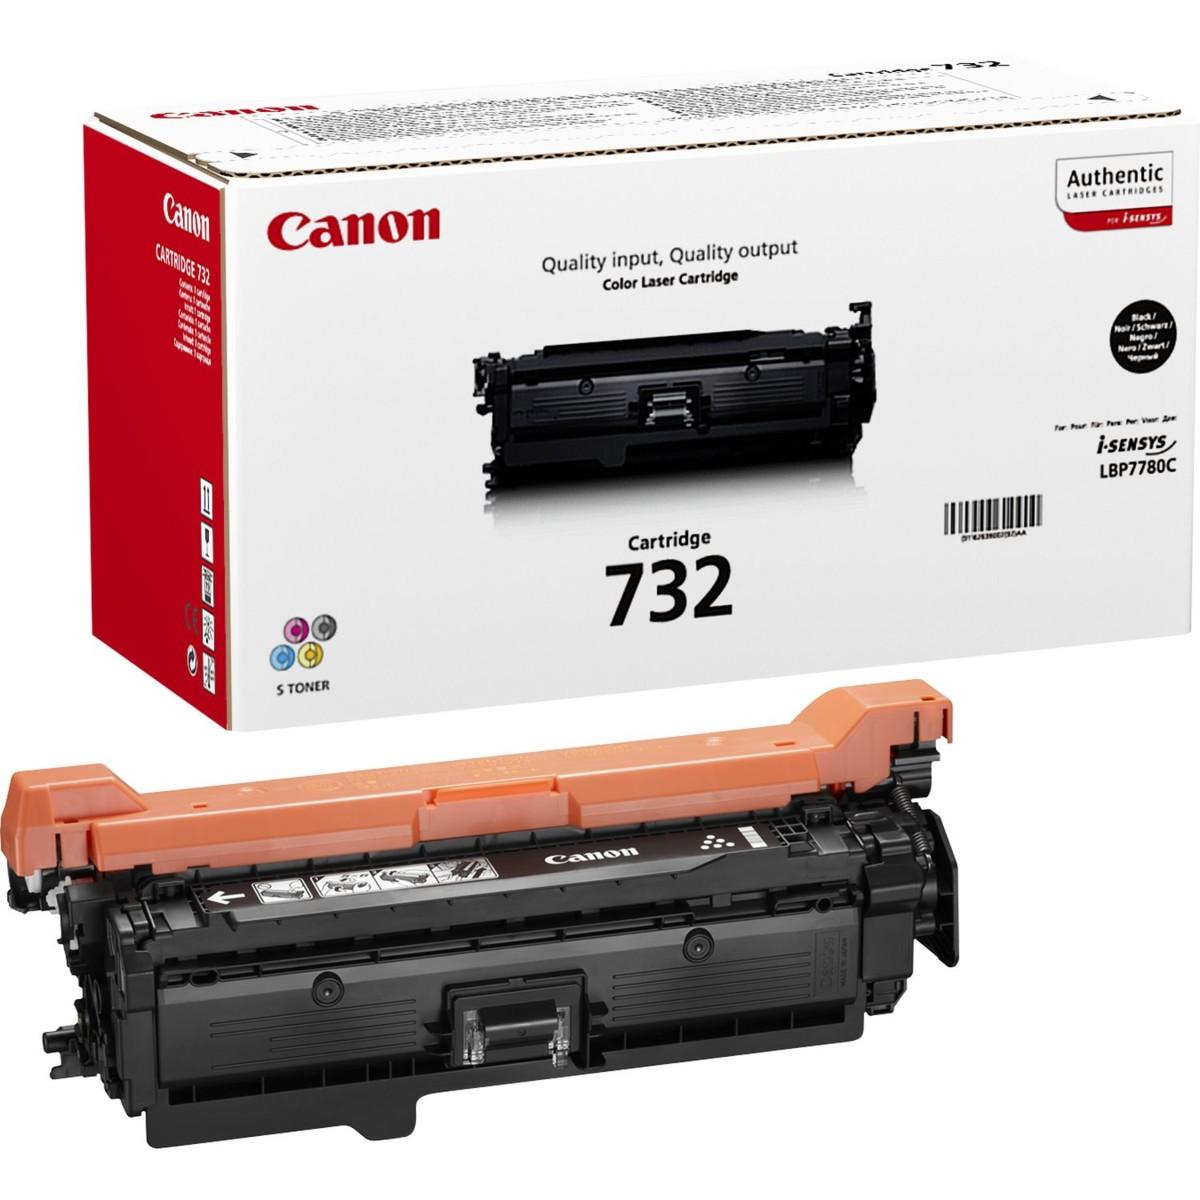 Toner Canon CRG-732Bk (Čierny) - originálný